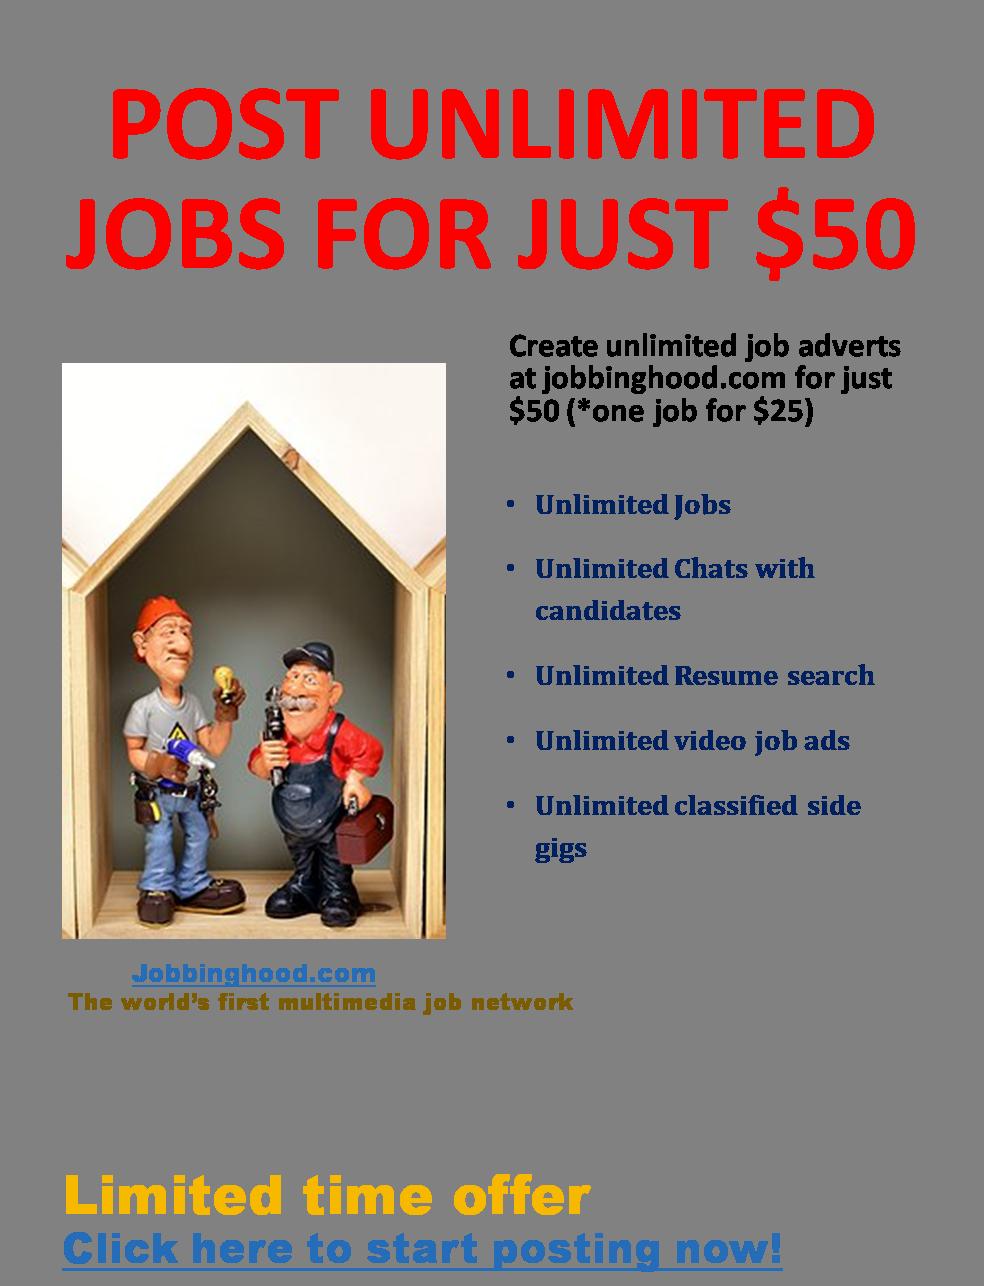 Pin by Jobbinghood on Cool Jobs in 2020 Job ads, Job